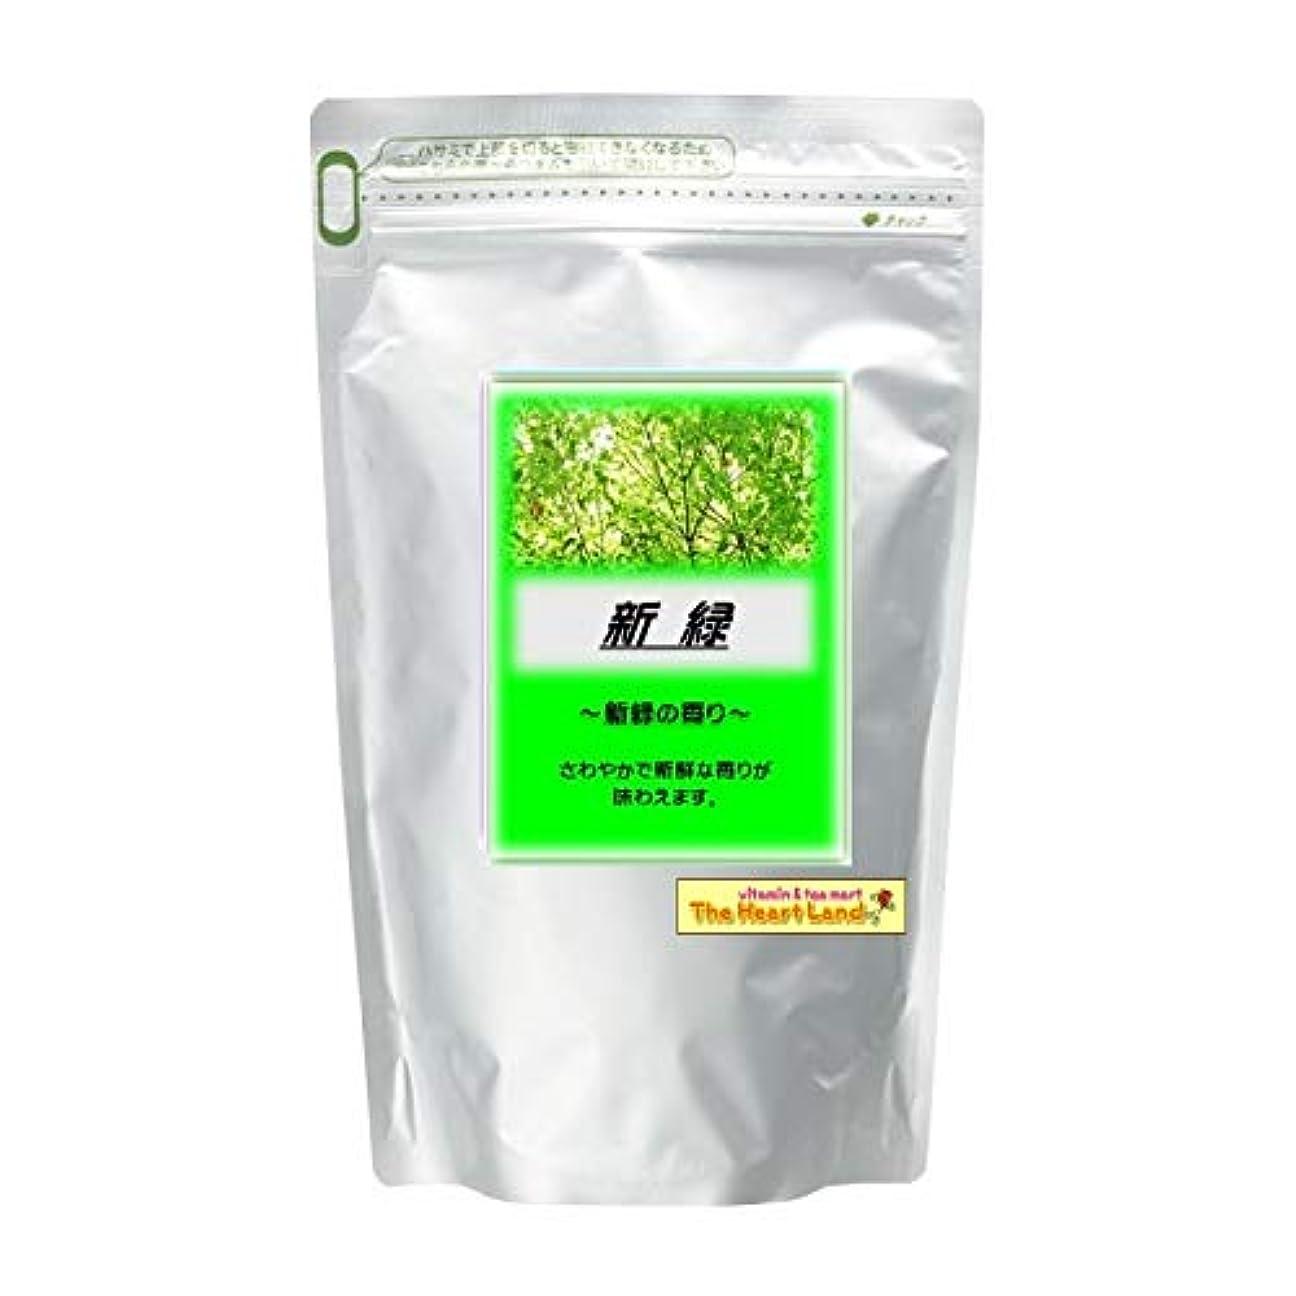 ポンド実質的に税金アサヒ入浴剤 浴用入浴化粧品 新緑 2.5kg